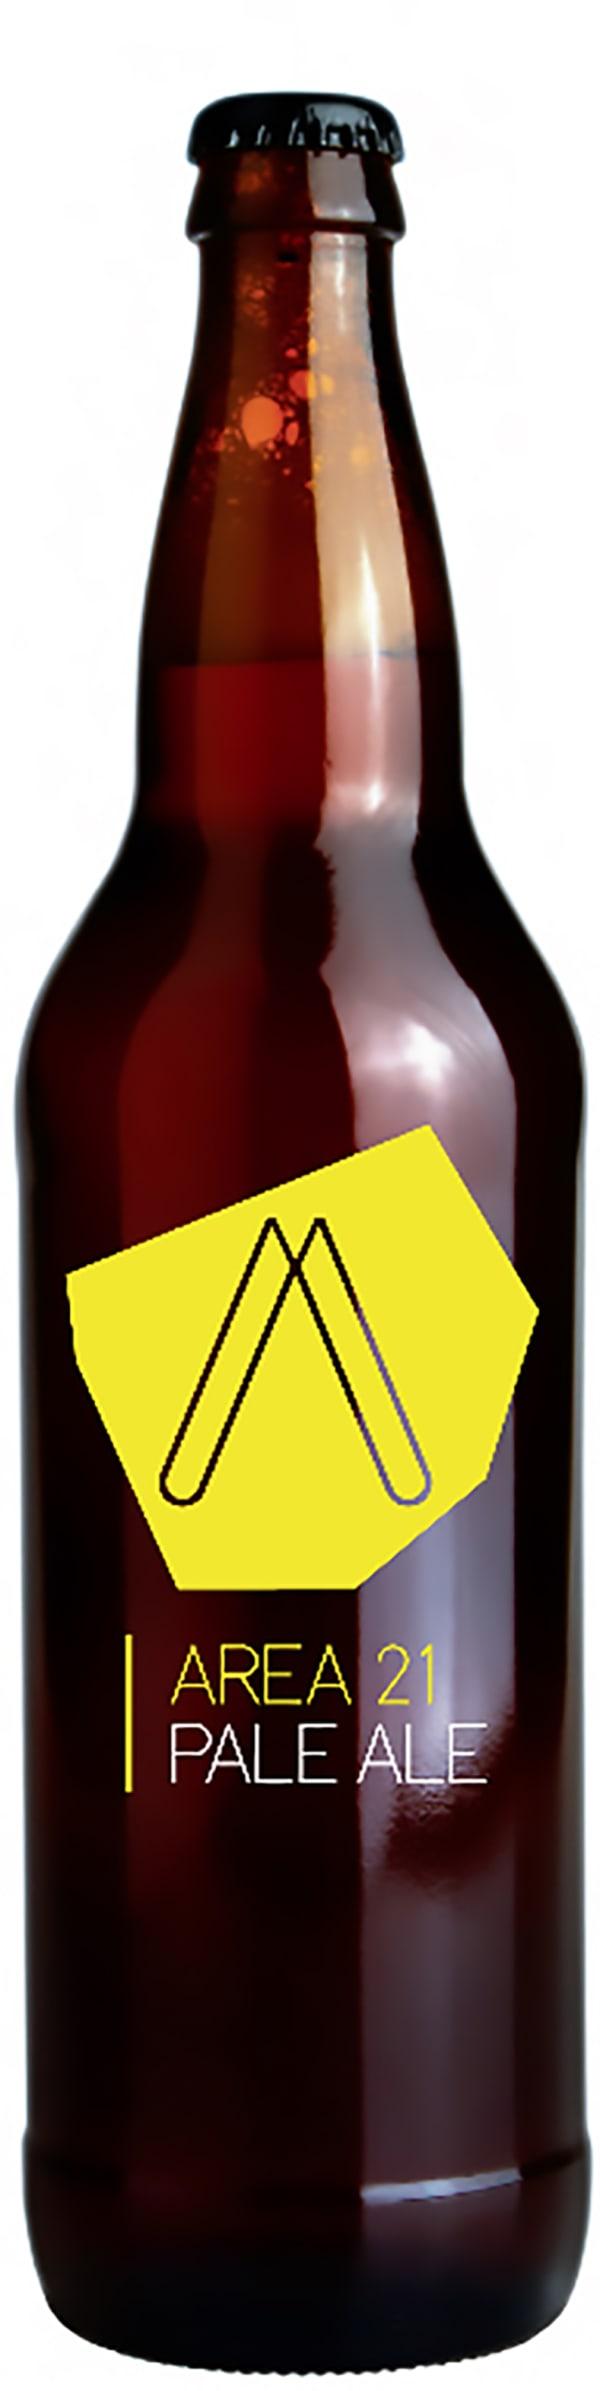 Olarin Panimo Area 21 Pale Ale